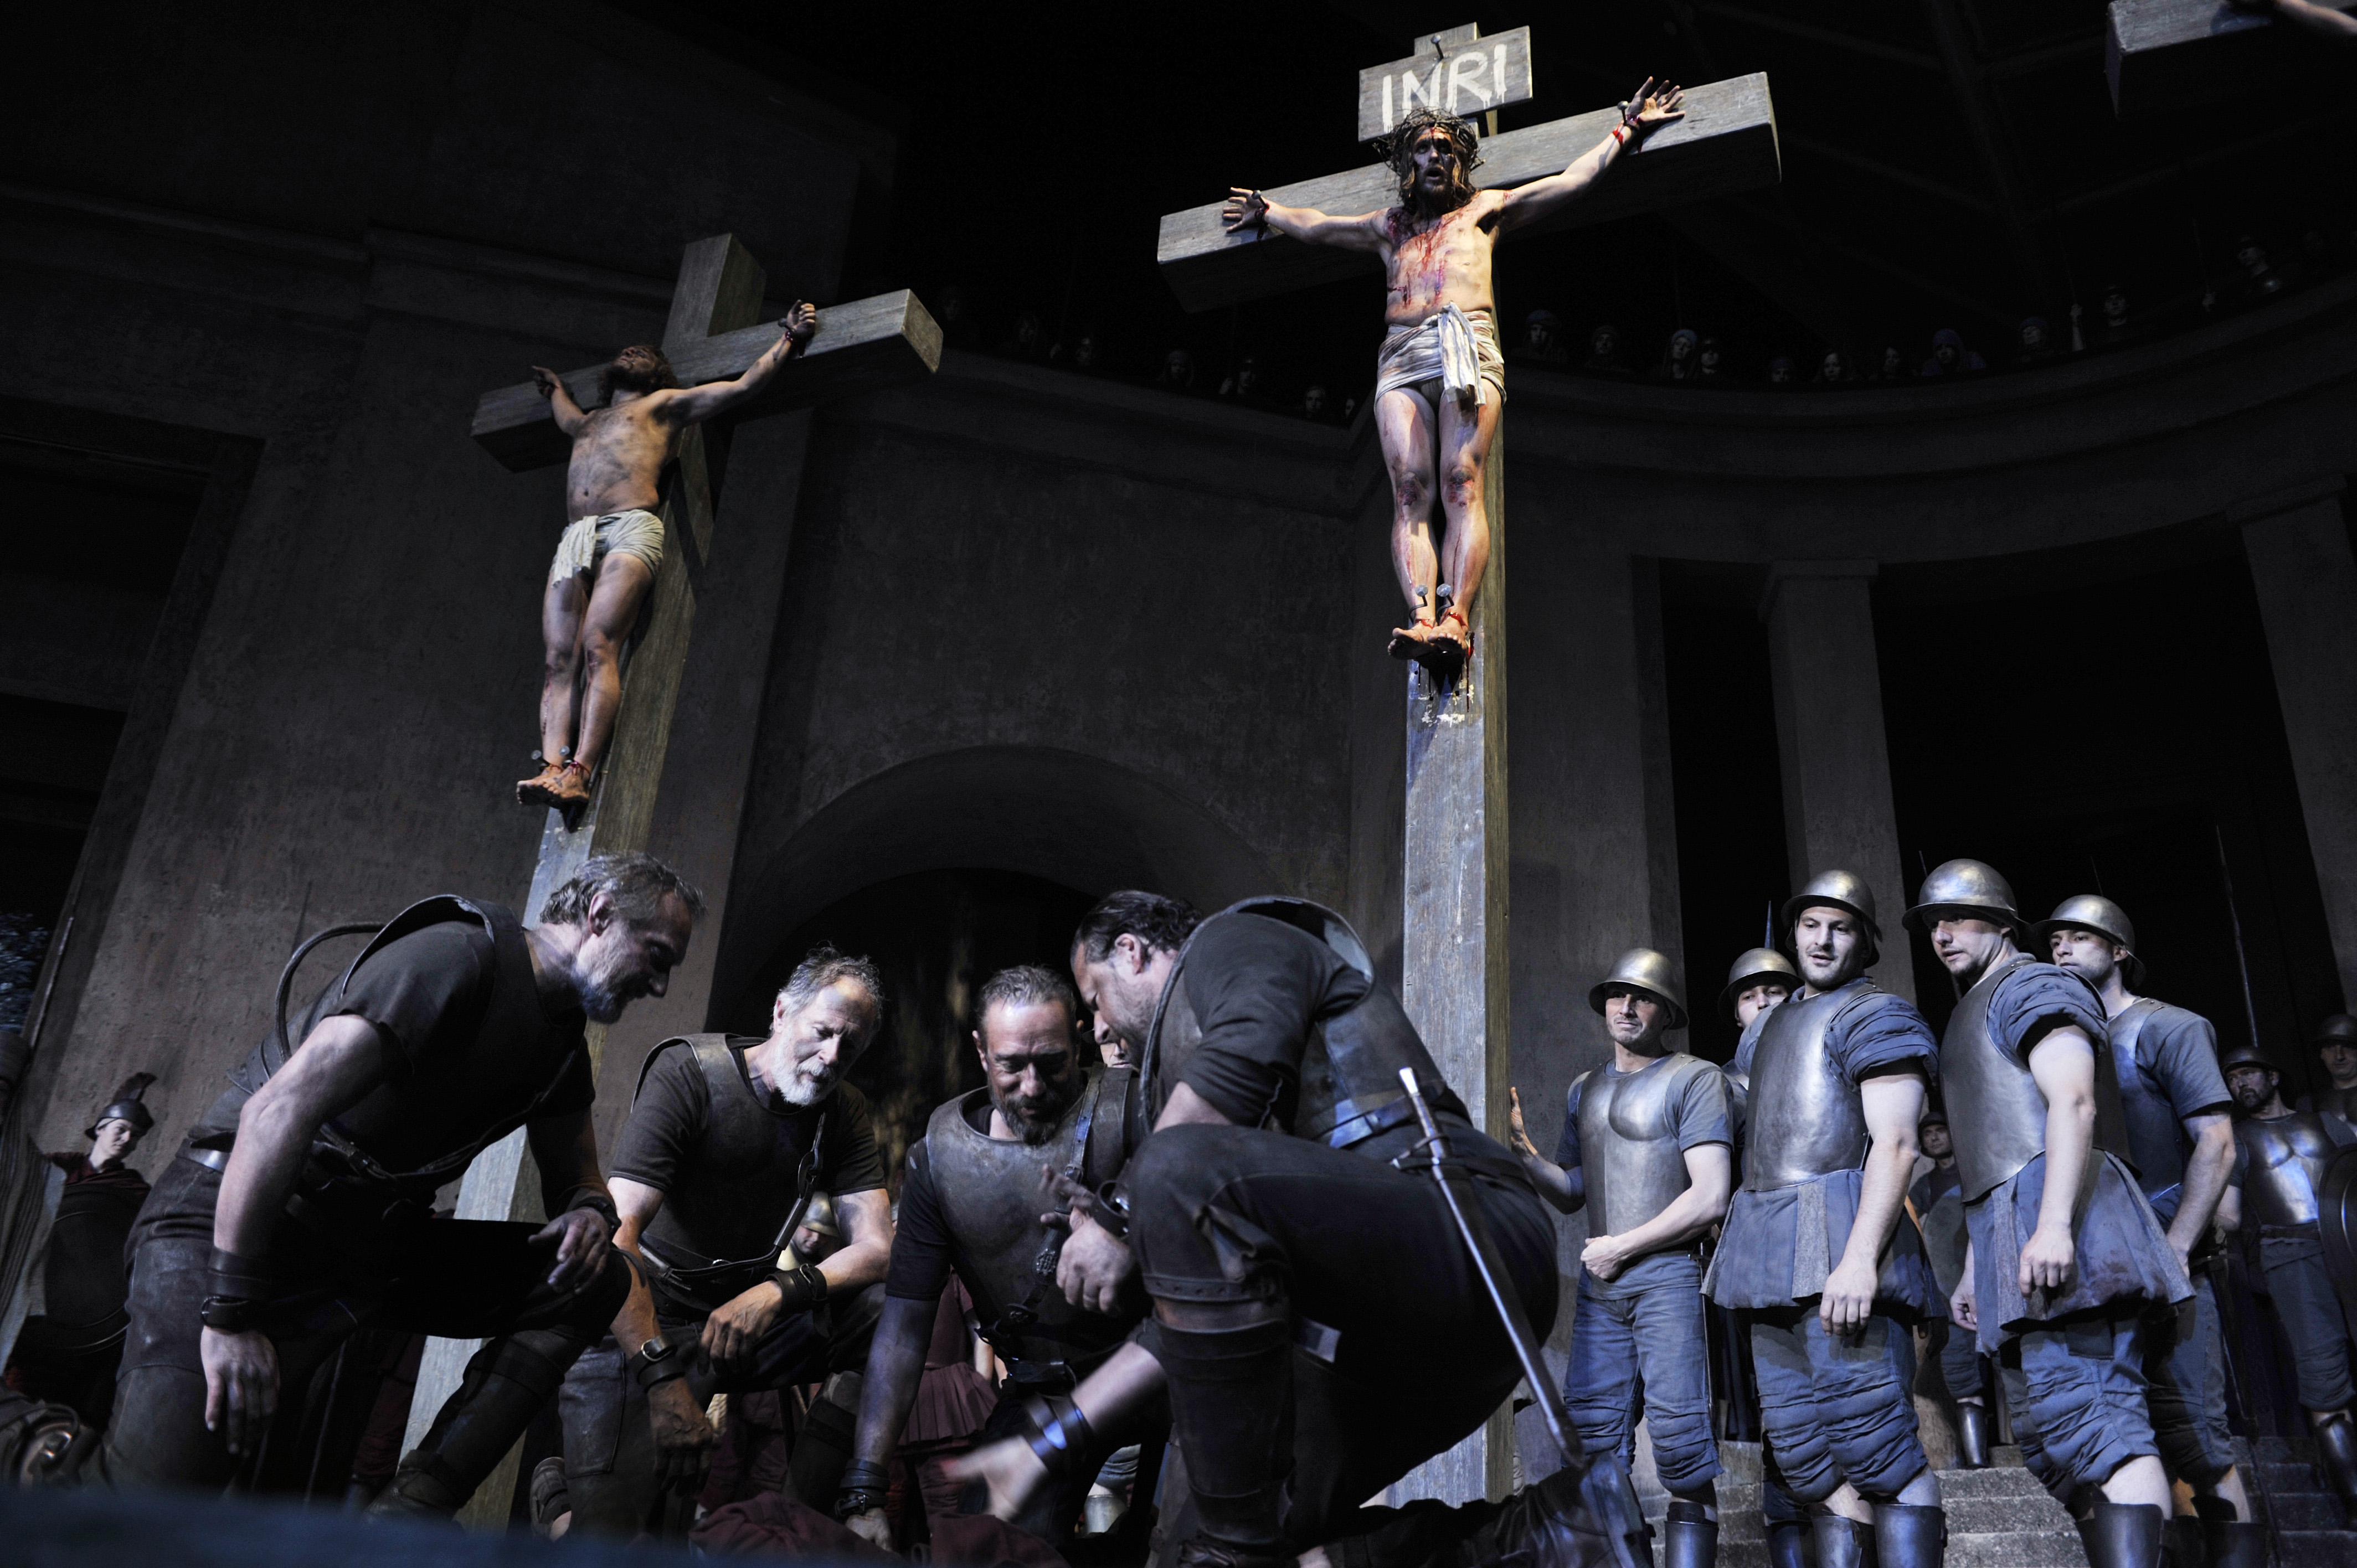 Breaking Travel News investigates: Oberammergau Passion Play 2020